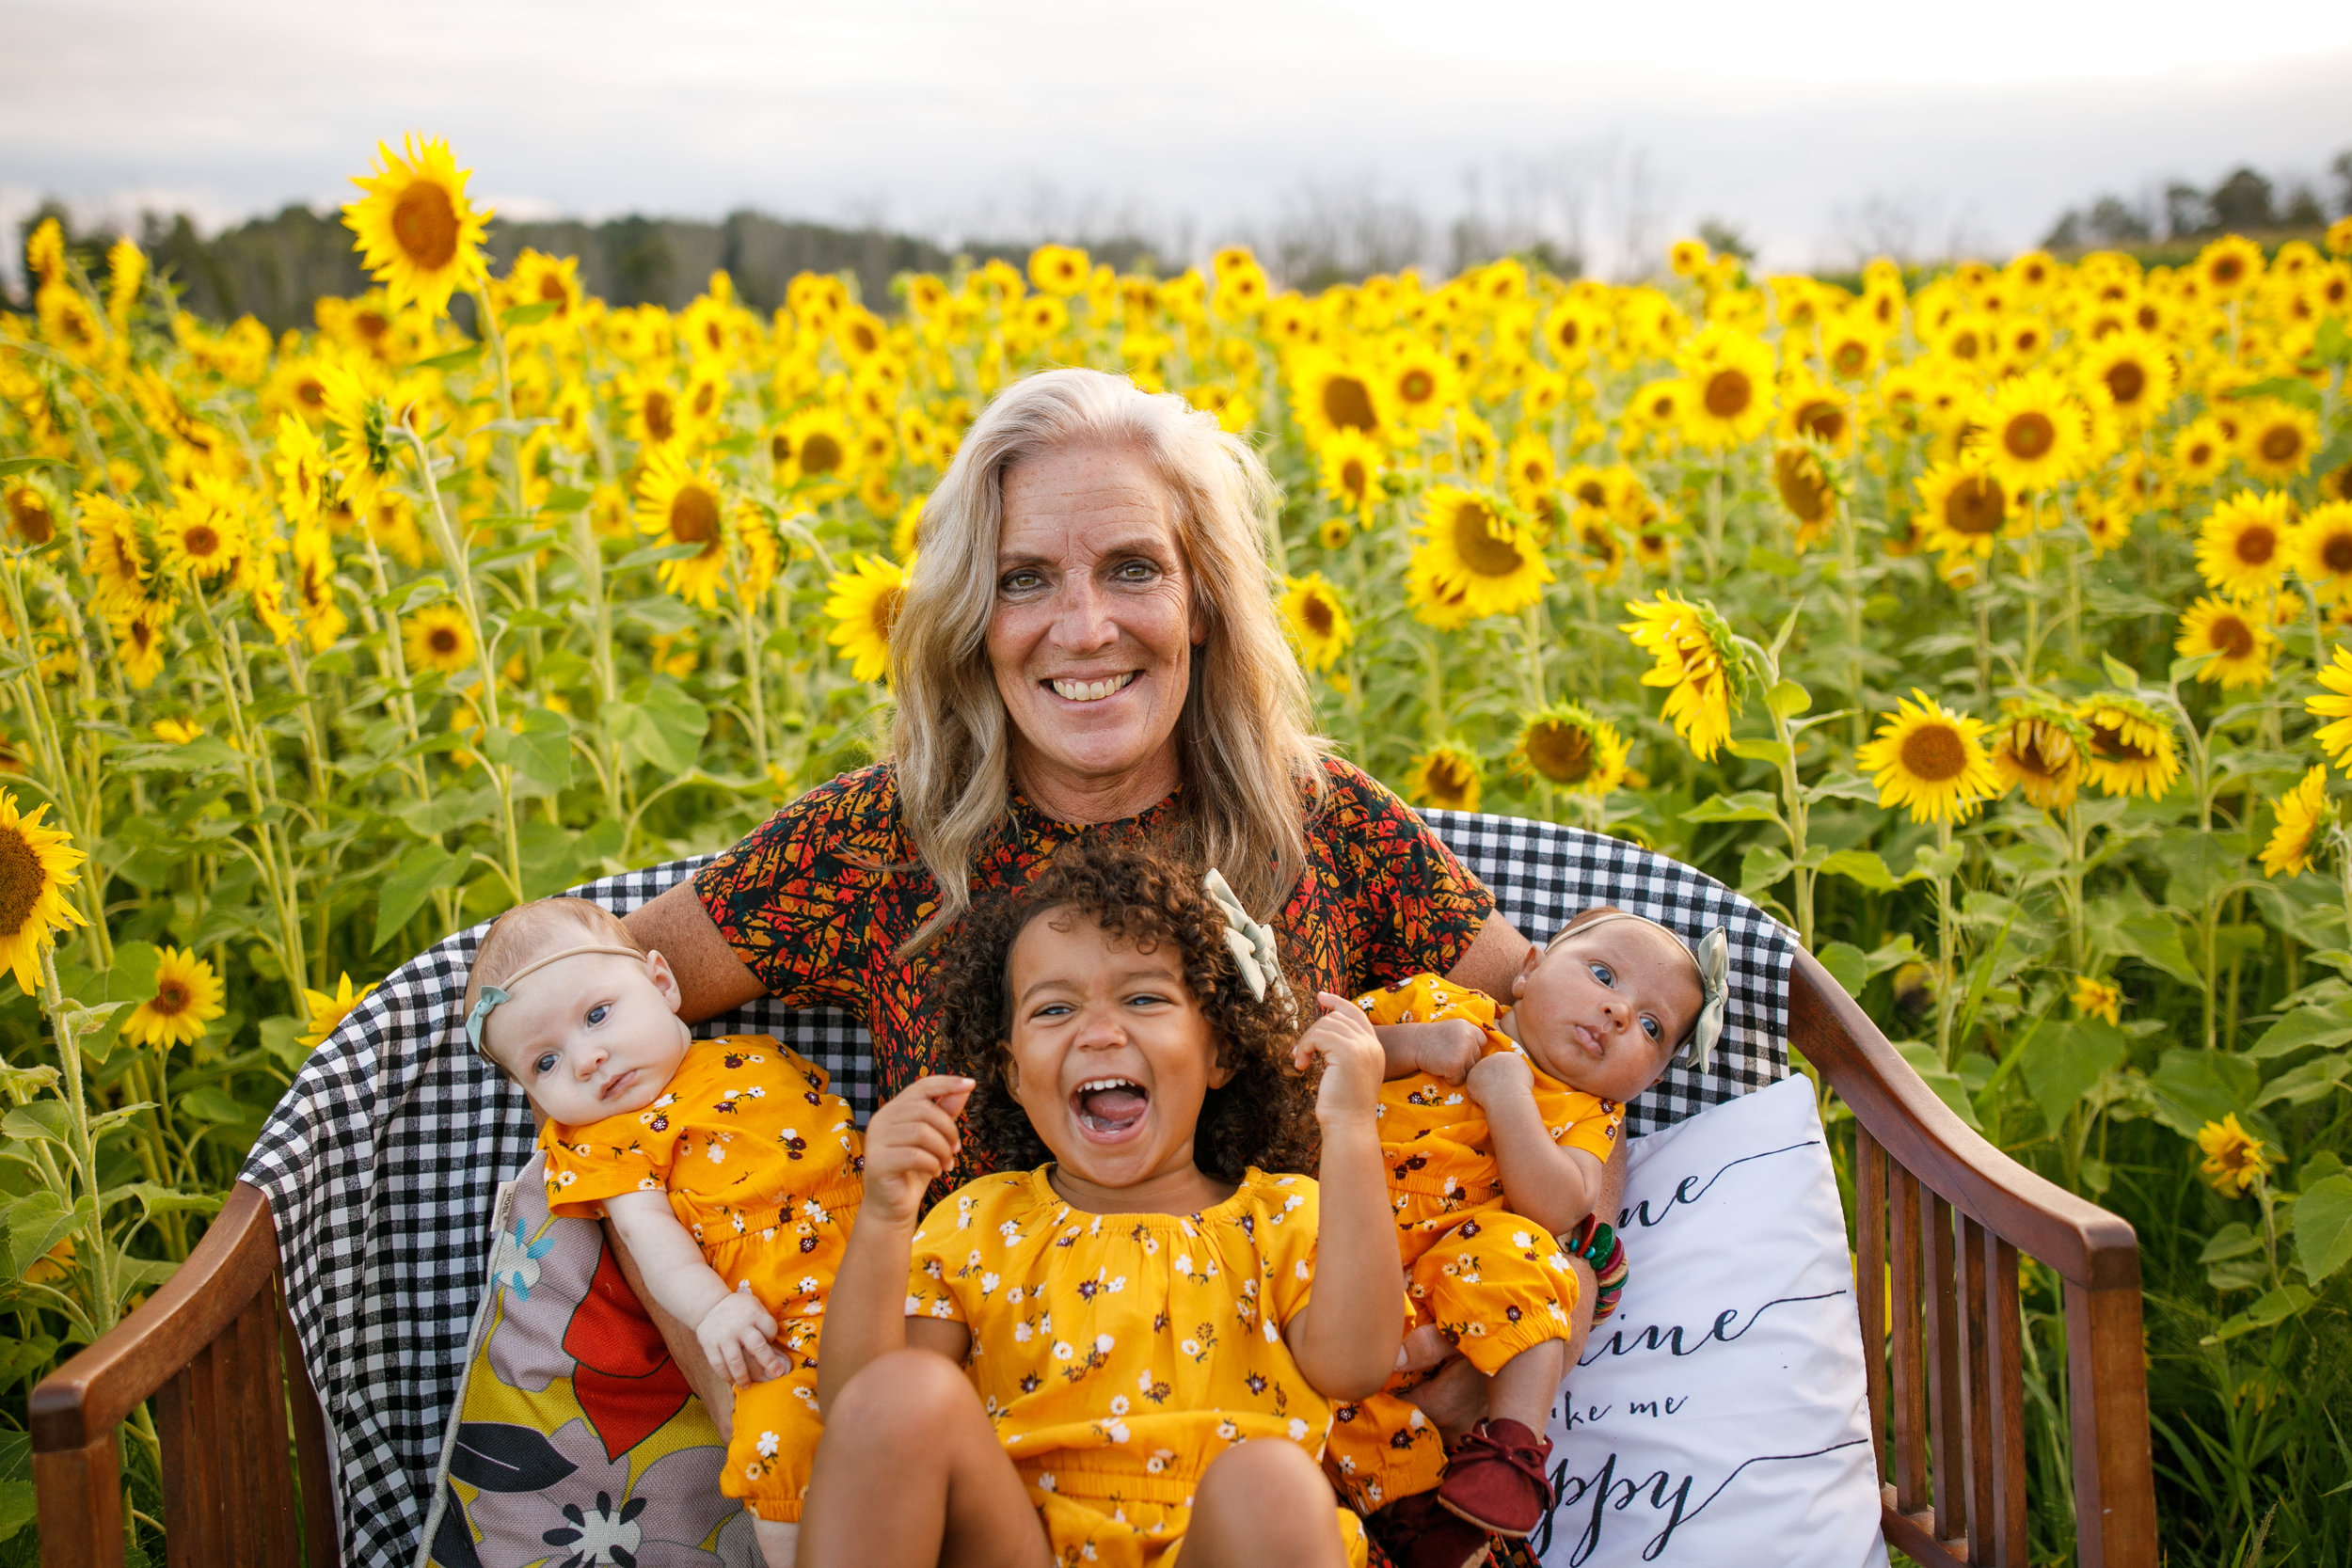 Morris Family Summer 2019 - Grand Rapids Photographer - Grand Rapids Family Photographer - Ed Dunneback and Girls - J Darling Photo 033.jpg